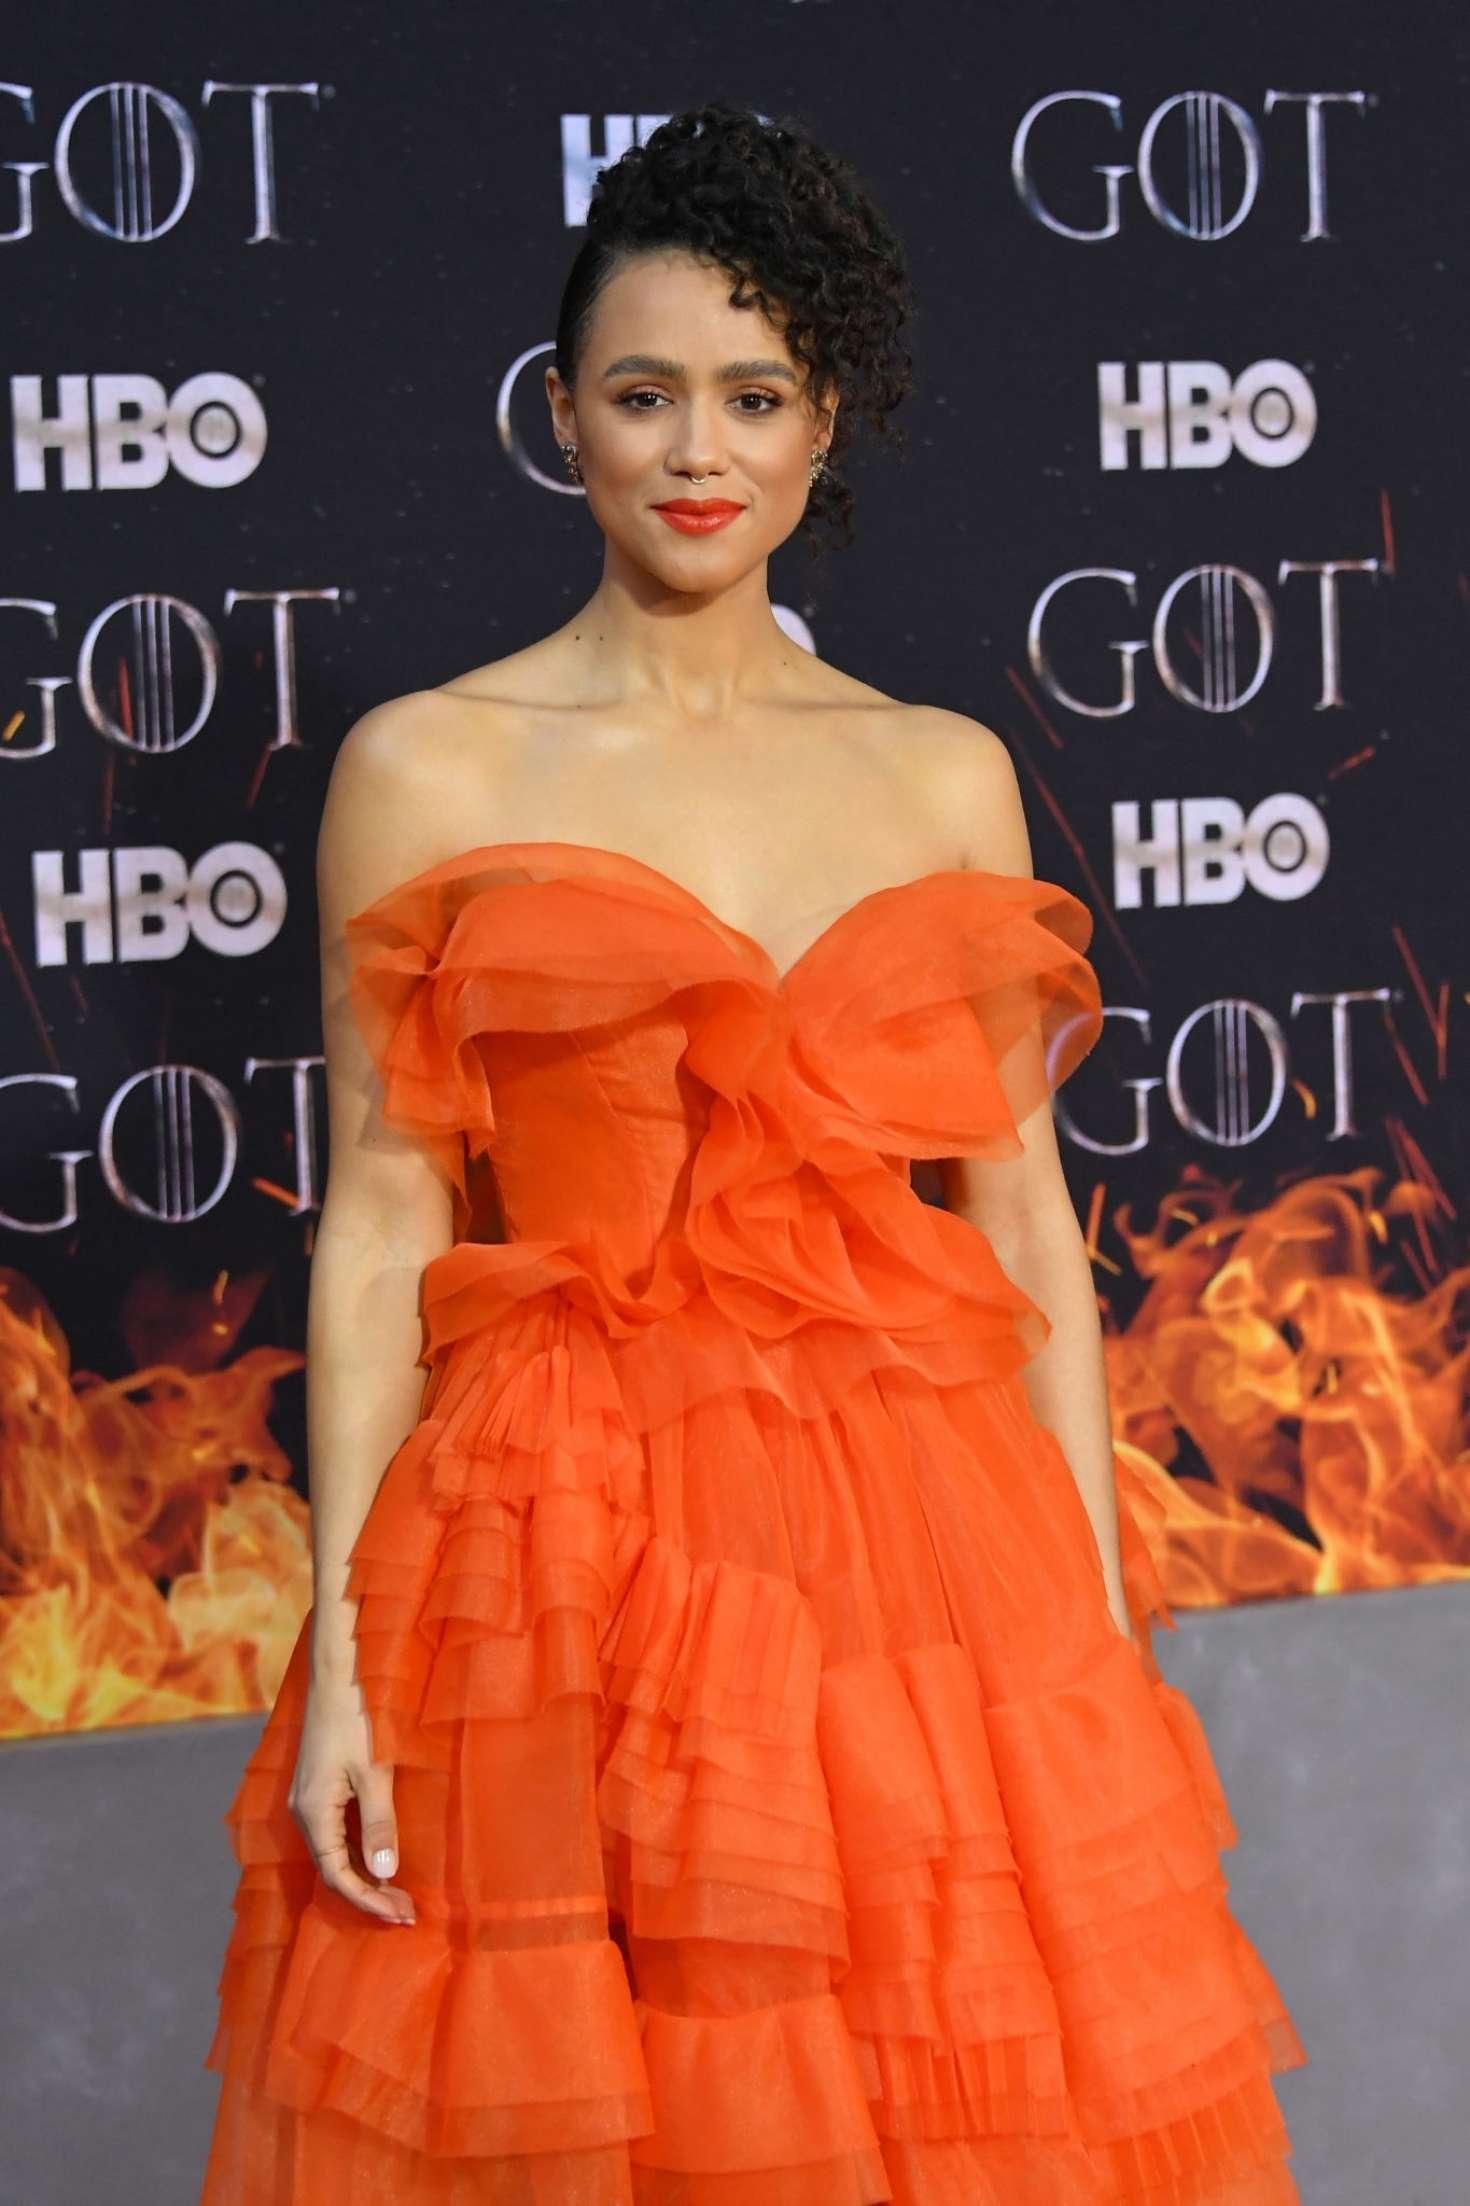 Nathalie Emmanuel 2019 : Nathalie Emmanuel: Game of Thrones Season 8 Premiere -01